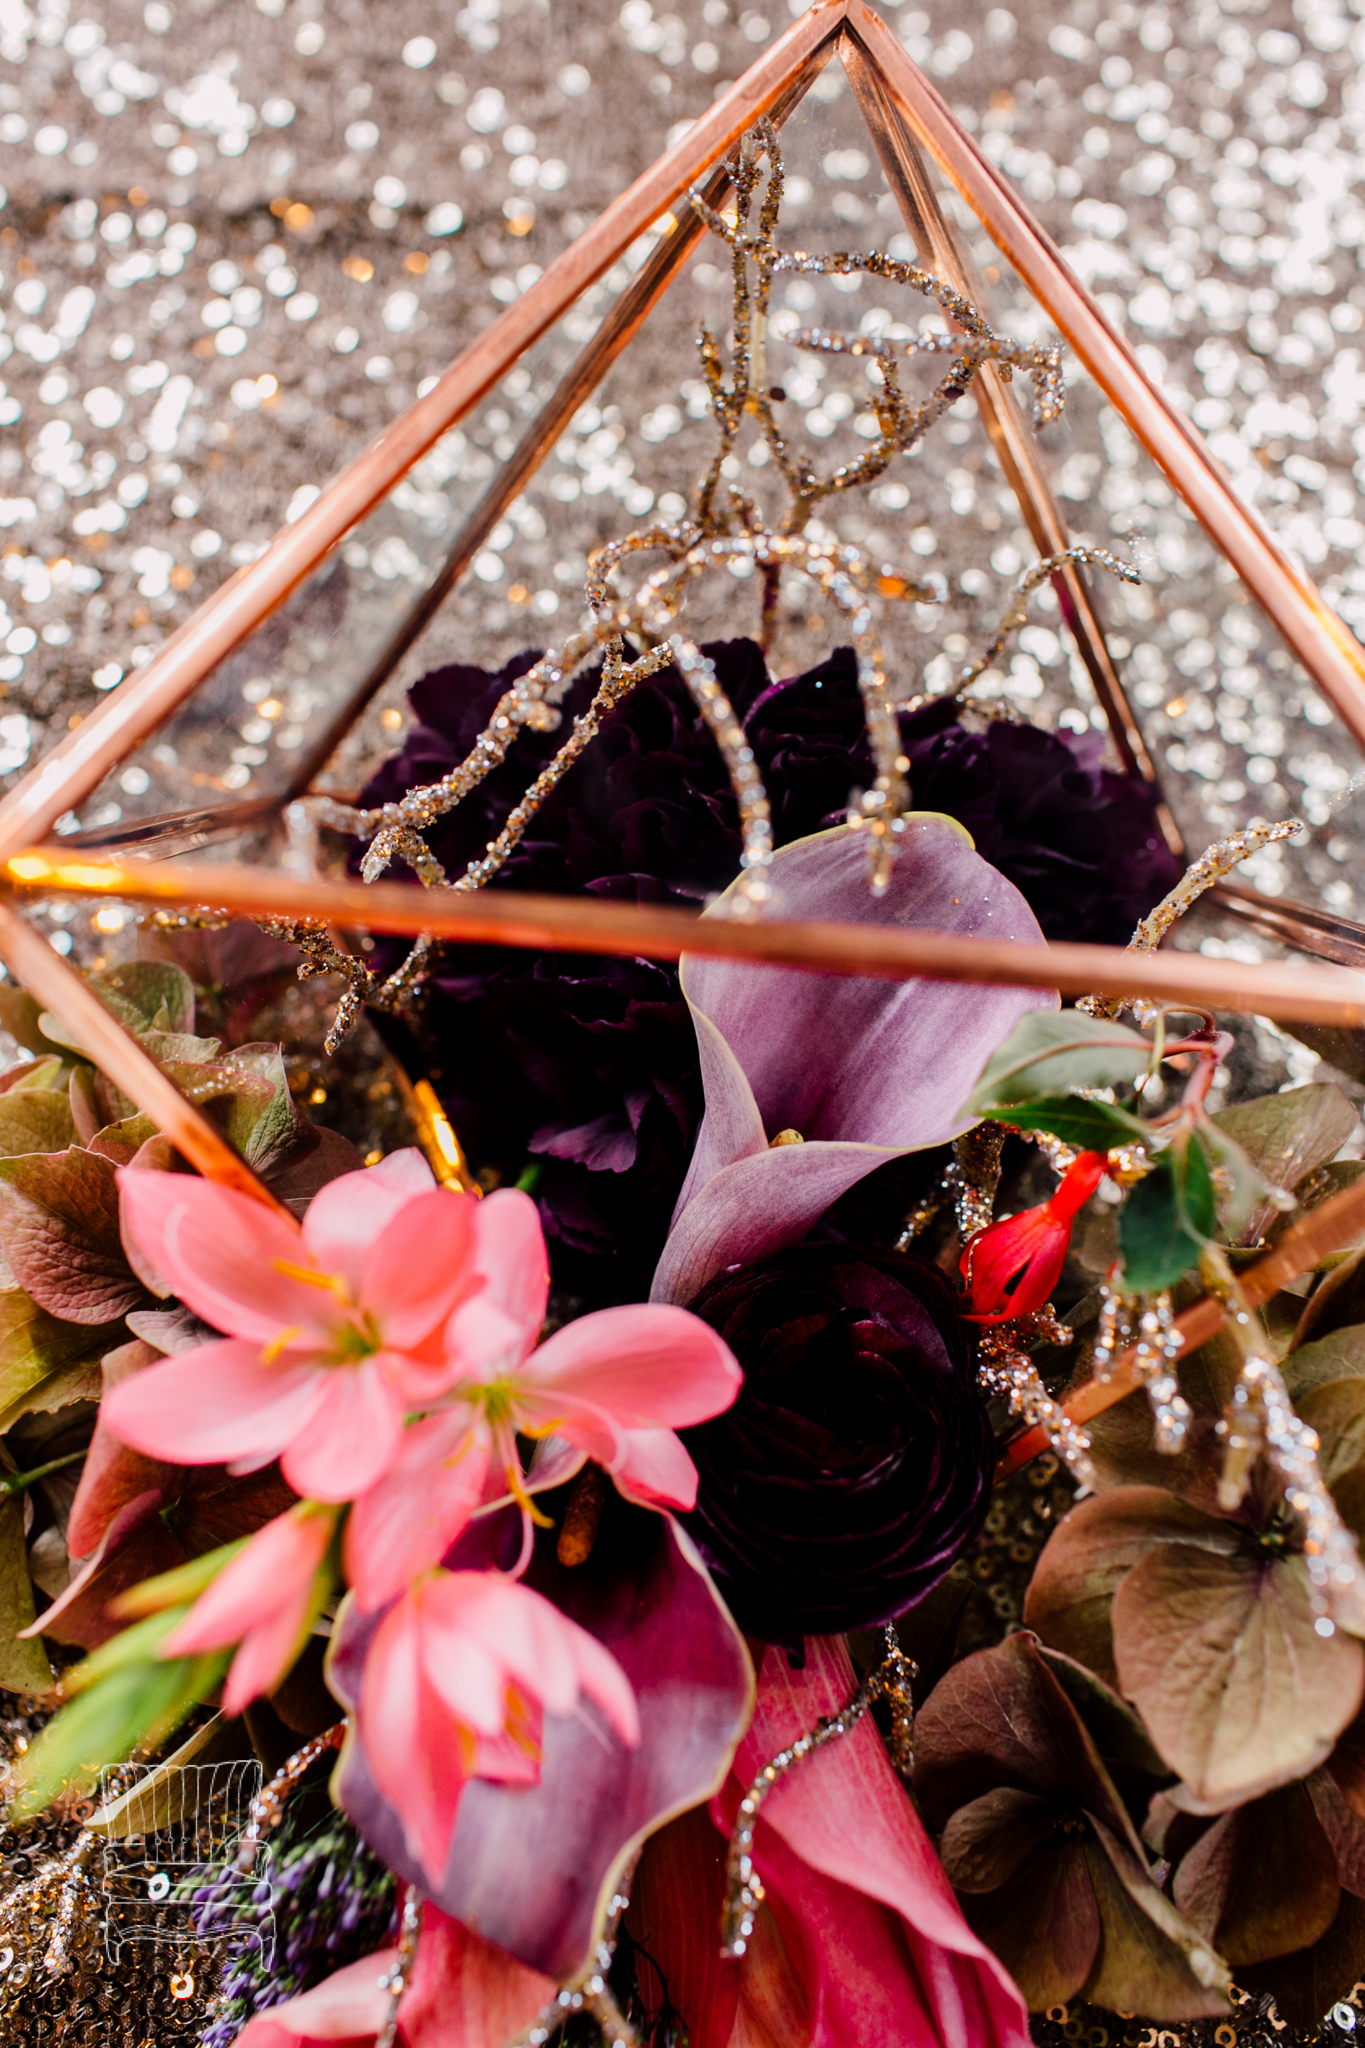 bellwether-hotel-bellingham-wedding-photographer-katheryn-moran-glitz-glam-styled-453.jpg